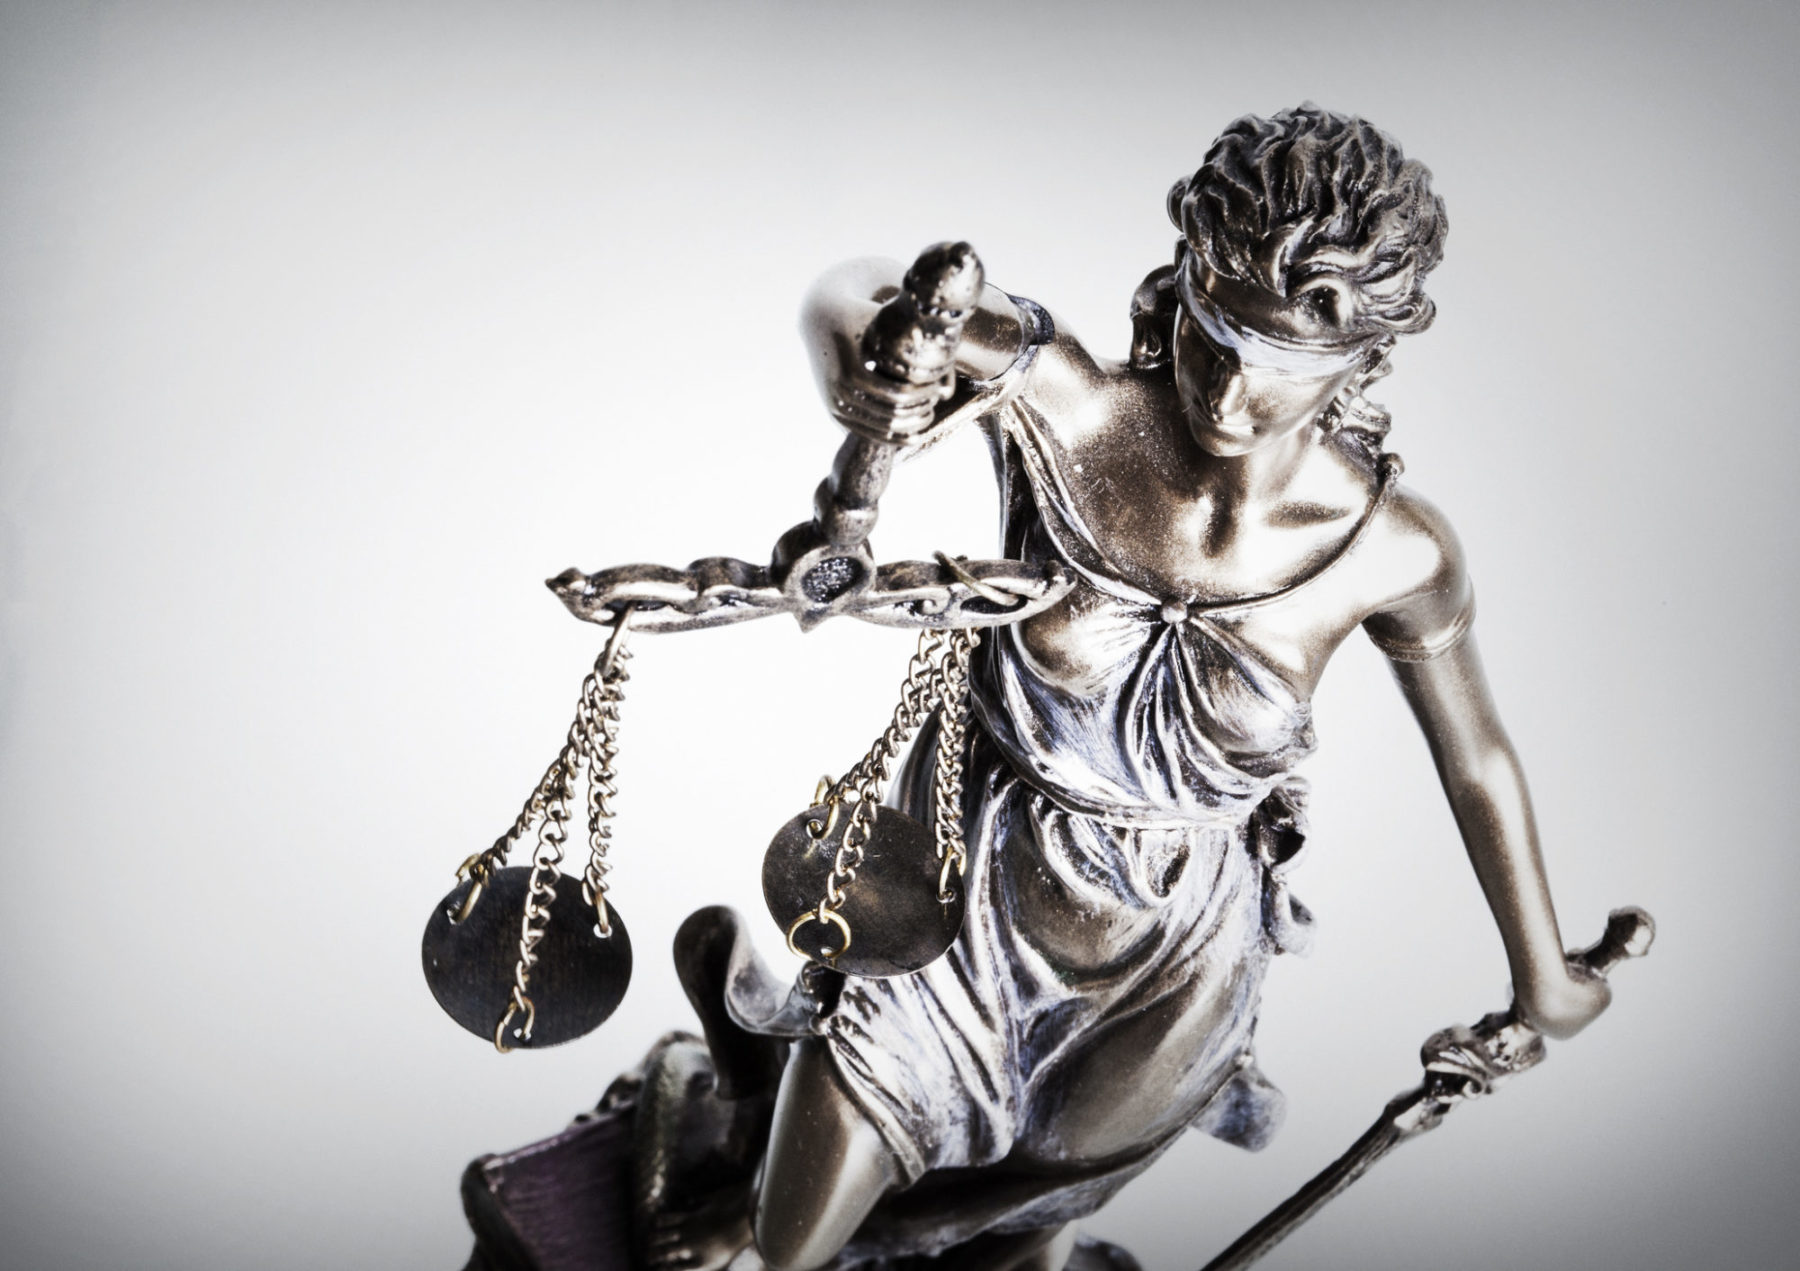 FITSNews – South Carolina Ethics Reform: Mandatory Minimums For Misbehaving Leaders